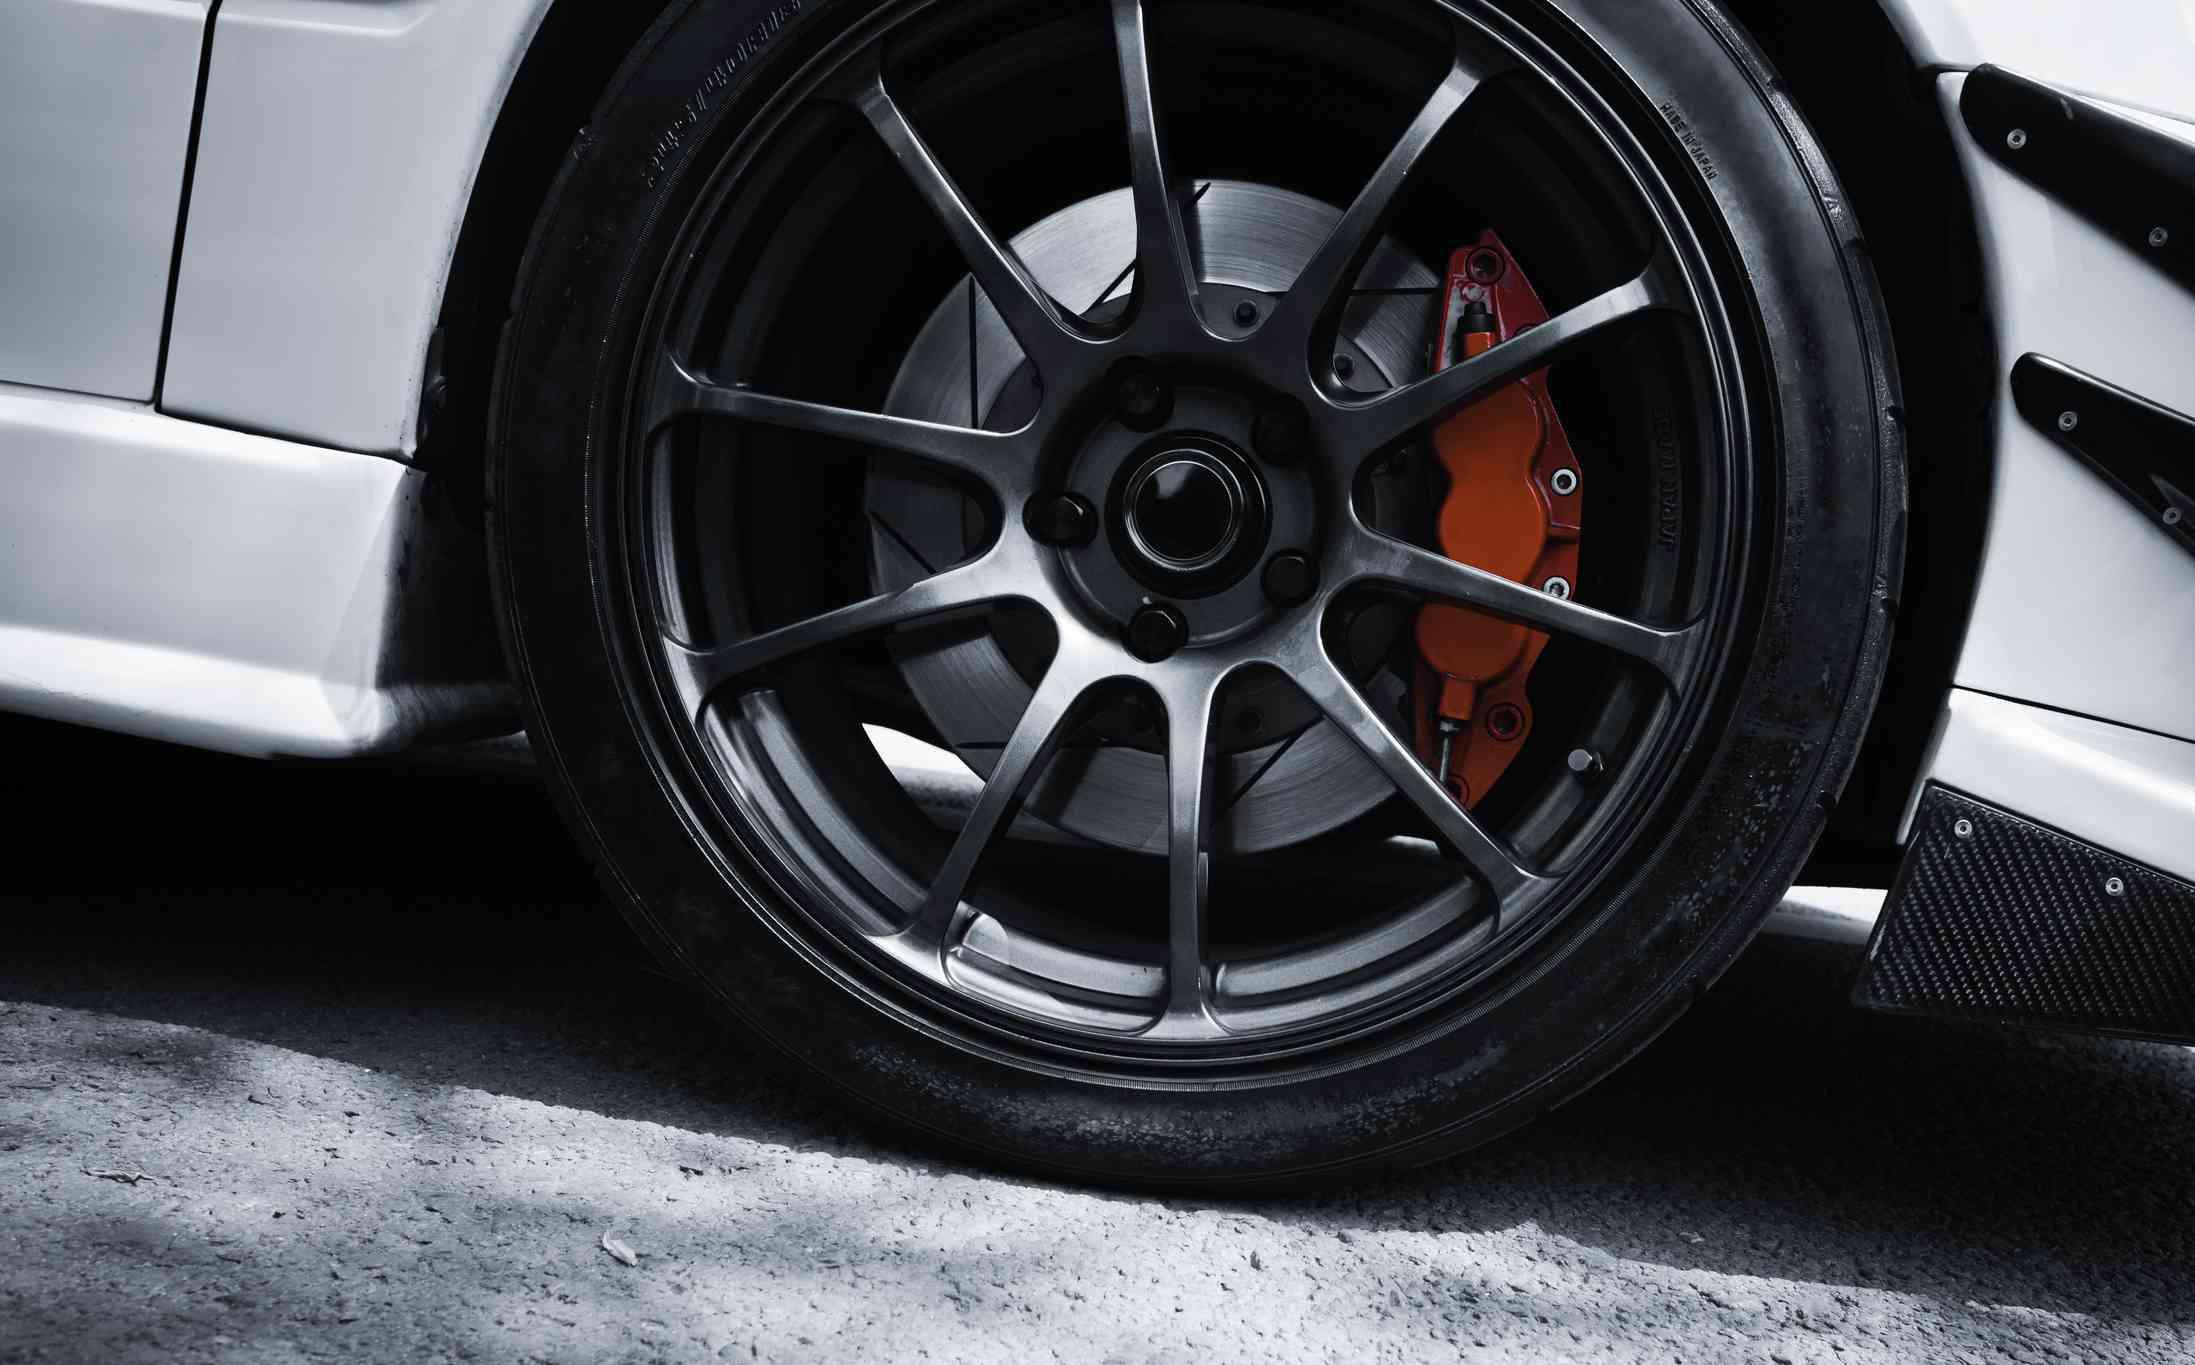 Red brake on a car